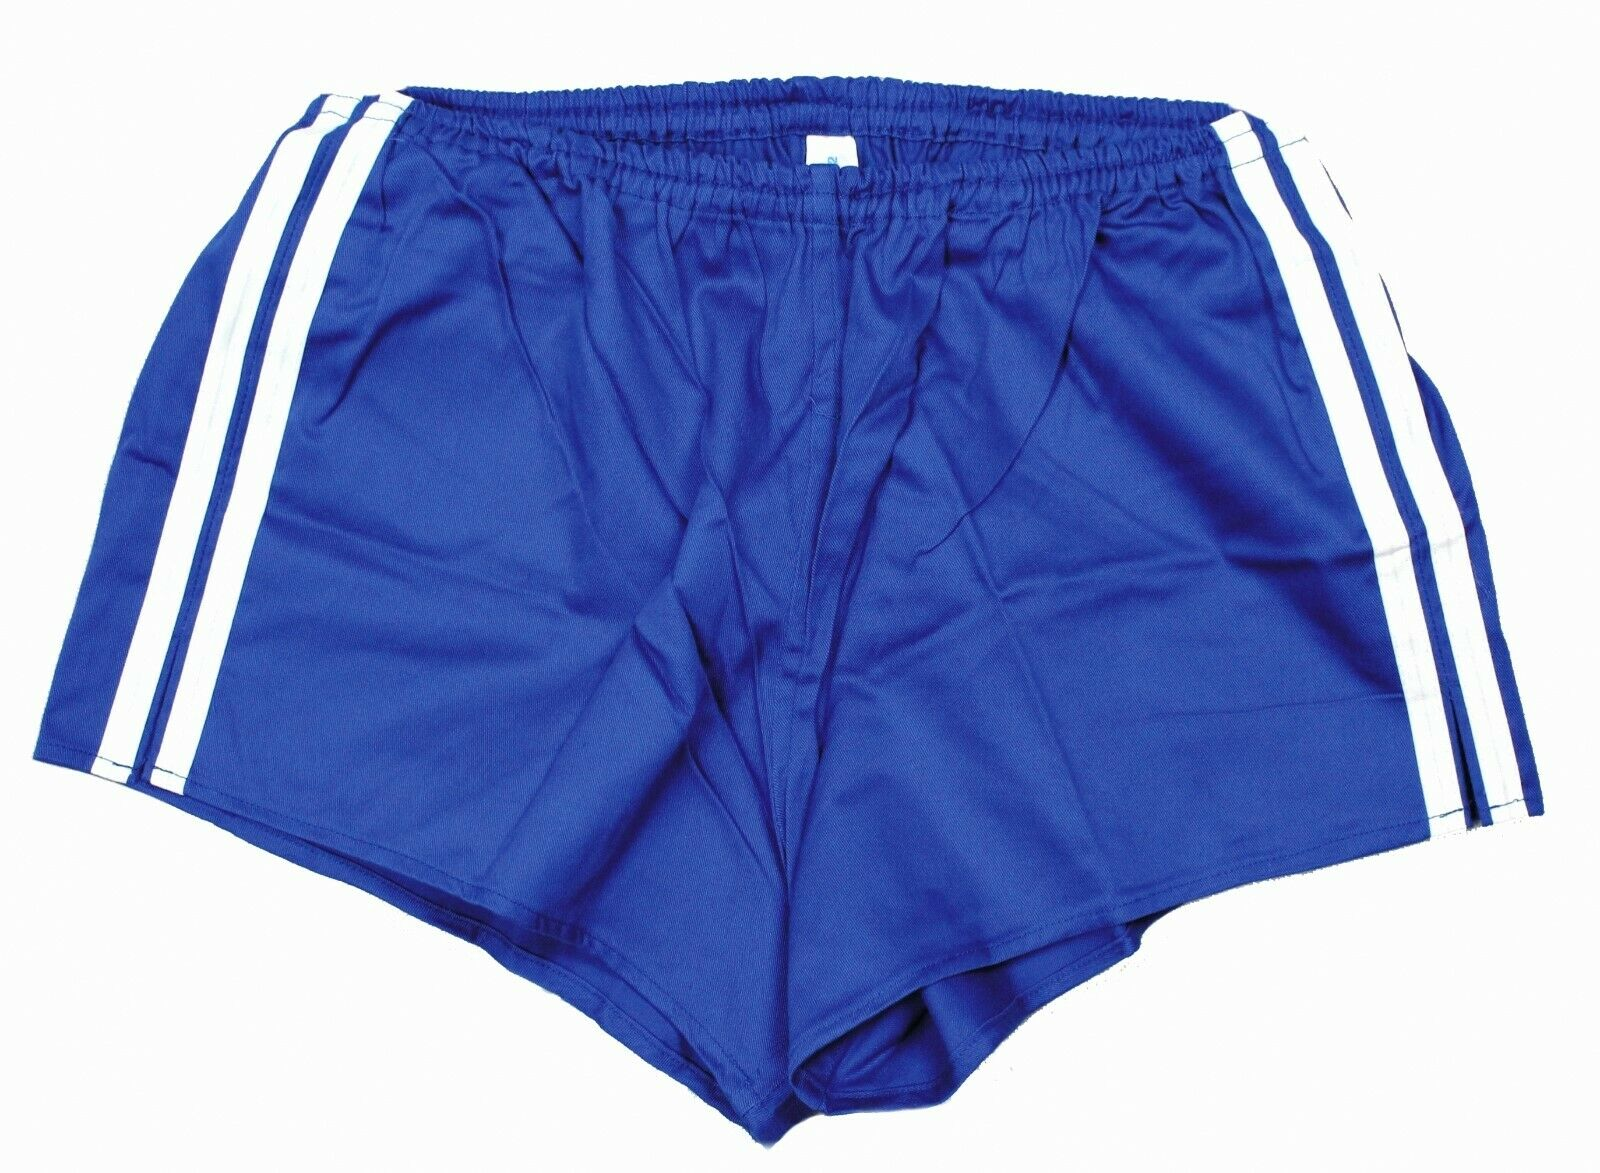 80er Shorts  Original GDR DDR Turnhose Sprinterhose Oldschool Sporthose  free and fast delivery available